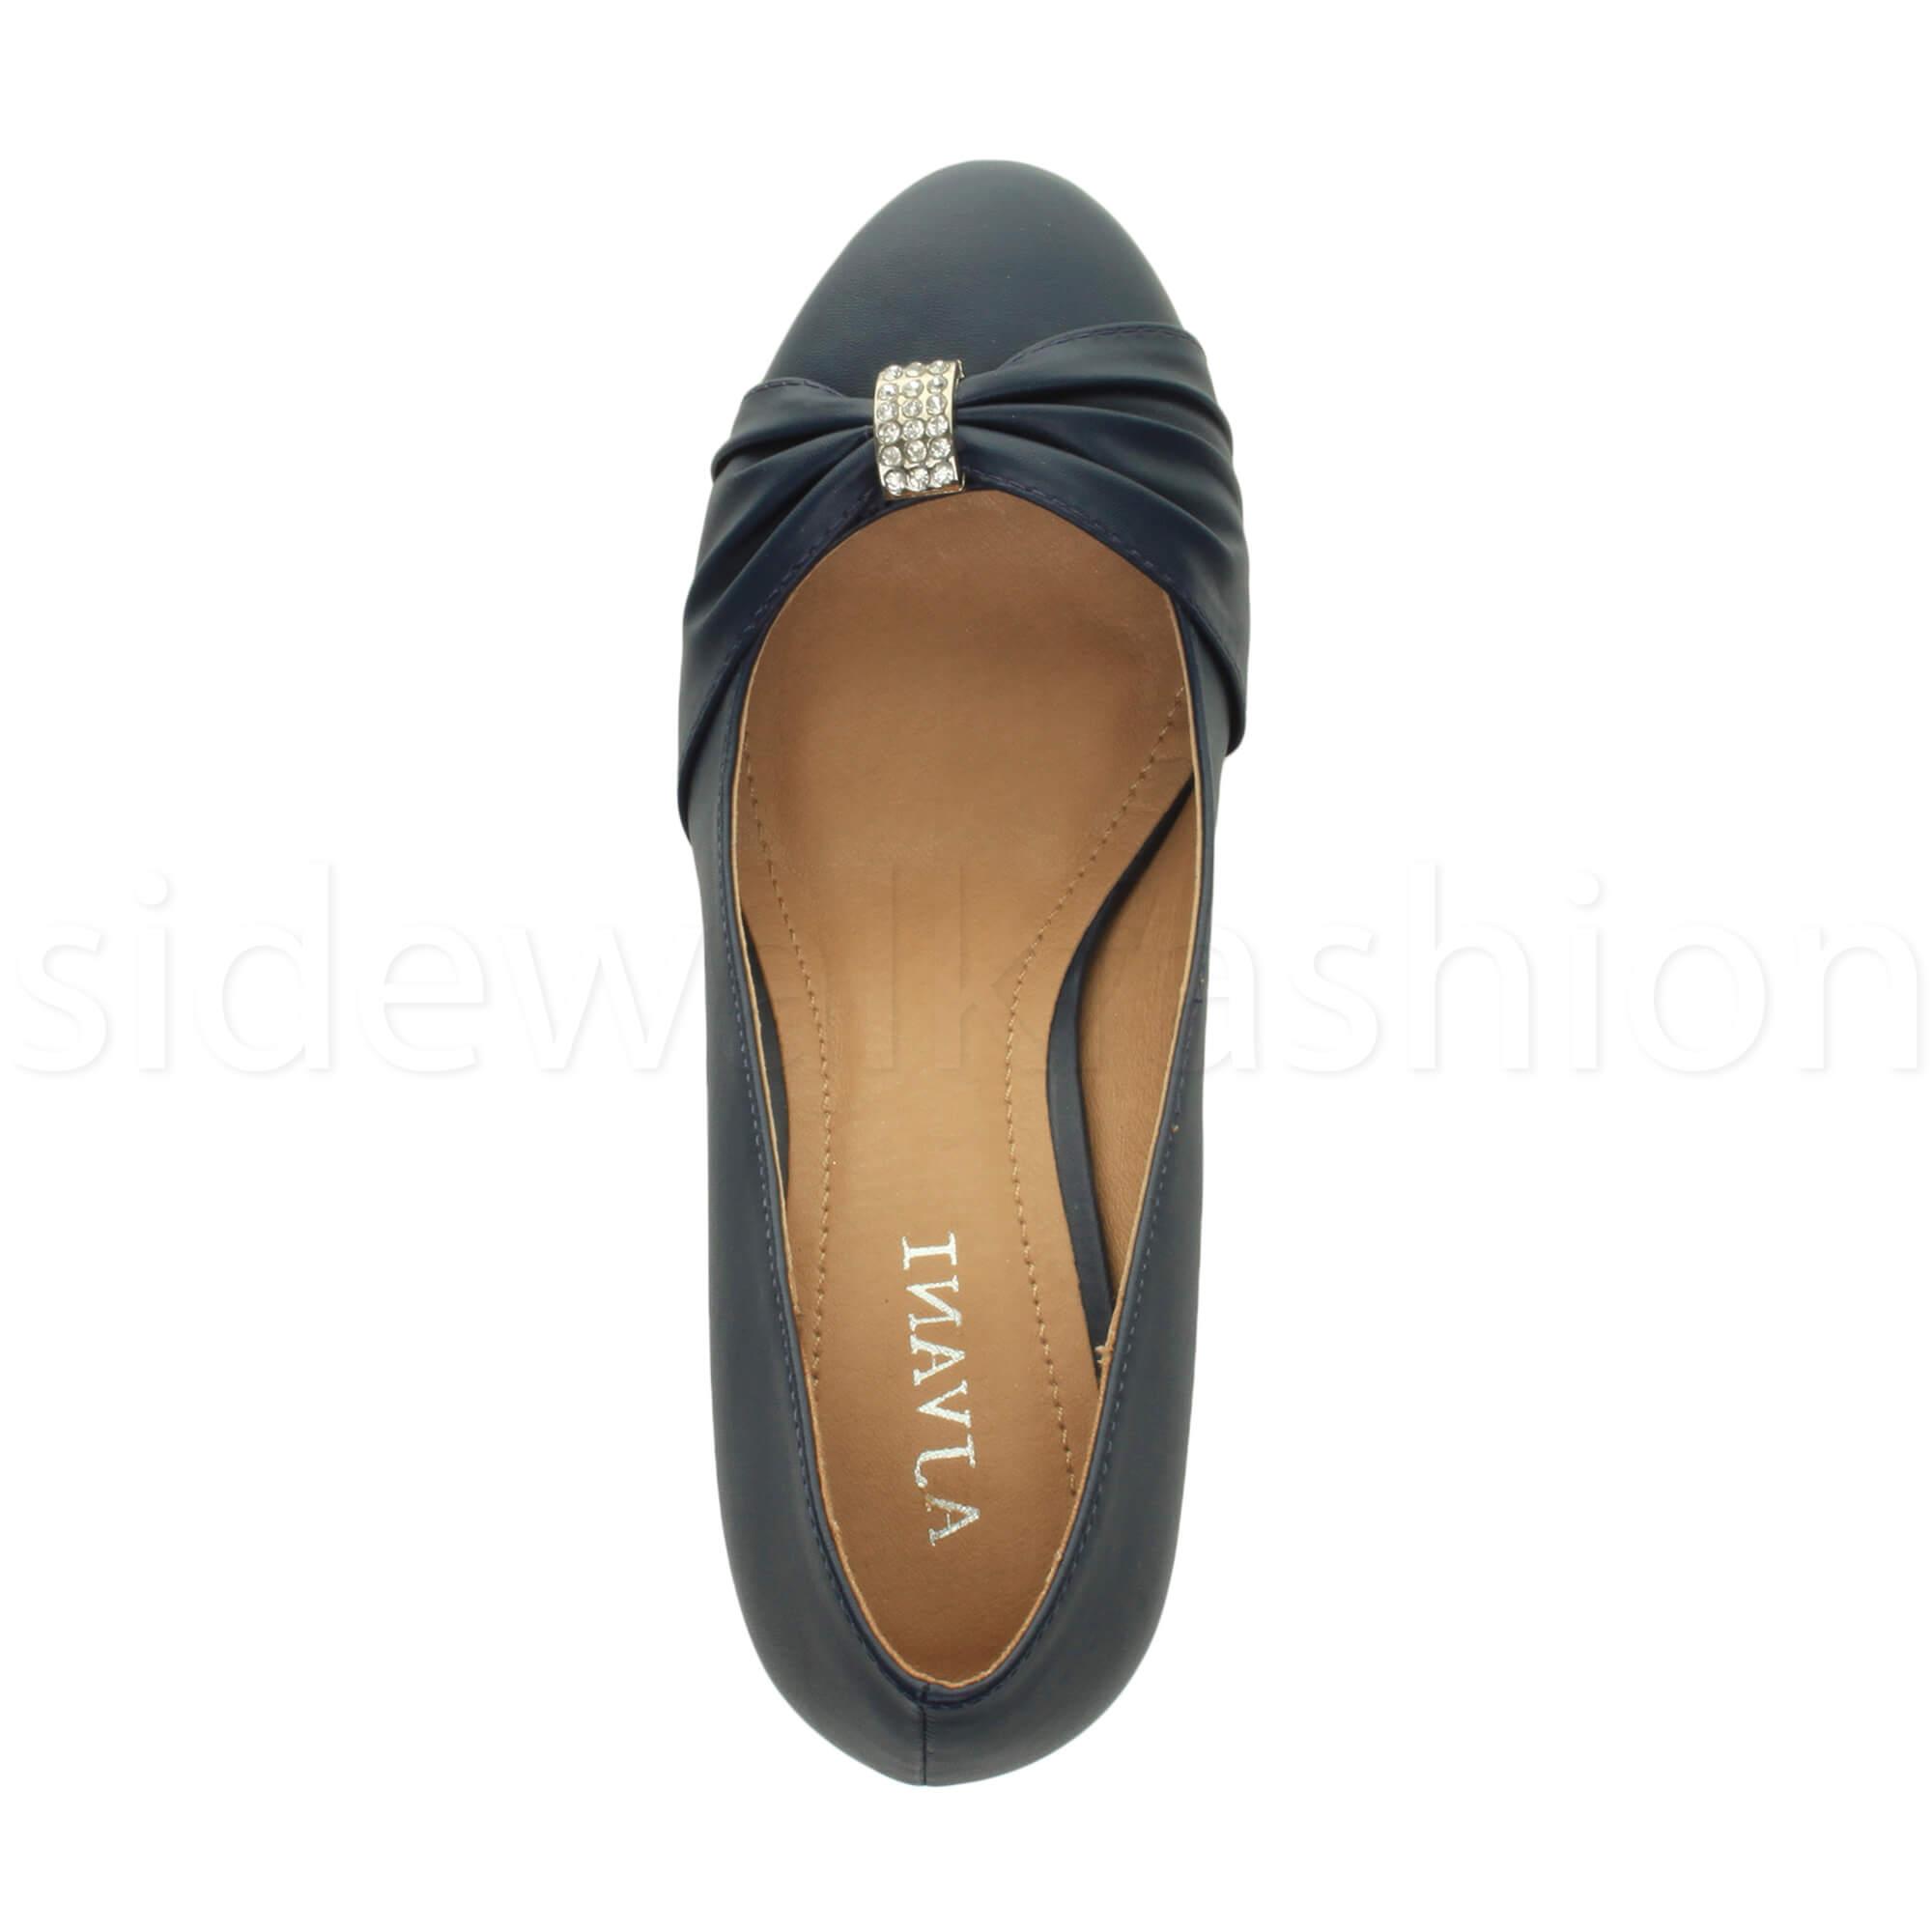 Womens-ladies-low-mid-heel-diamante-party-smart-evening-court-shoes-size thumbnail 48